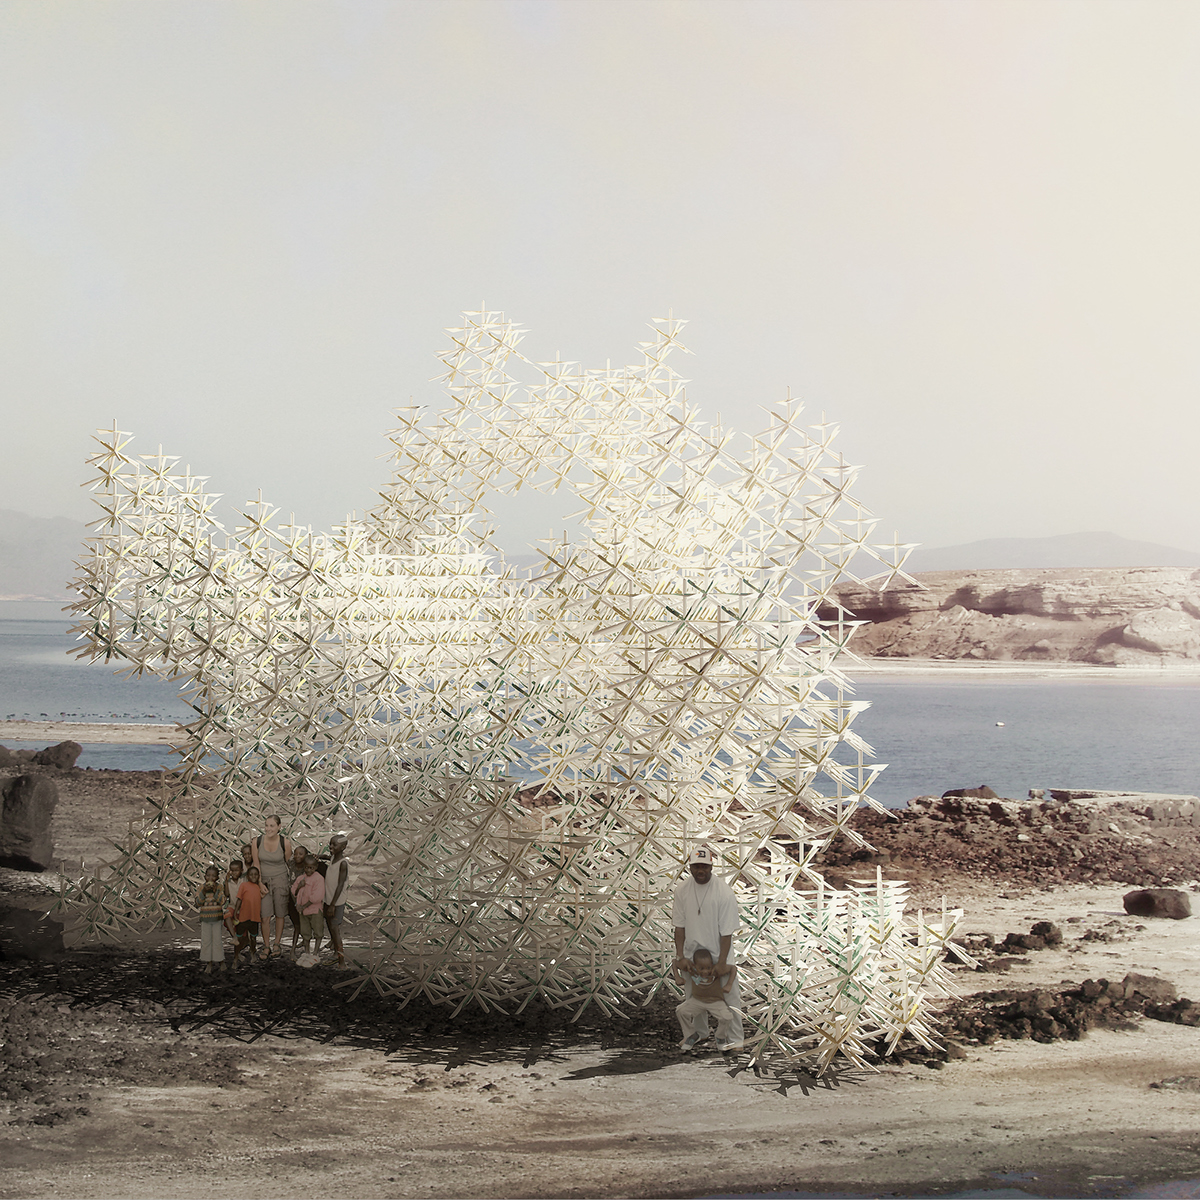 Adaptive energy processing scripting game stradegies wind lattice pavilion installation growth Ecology